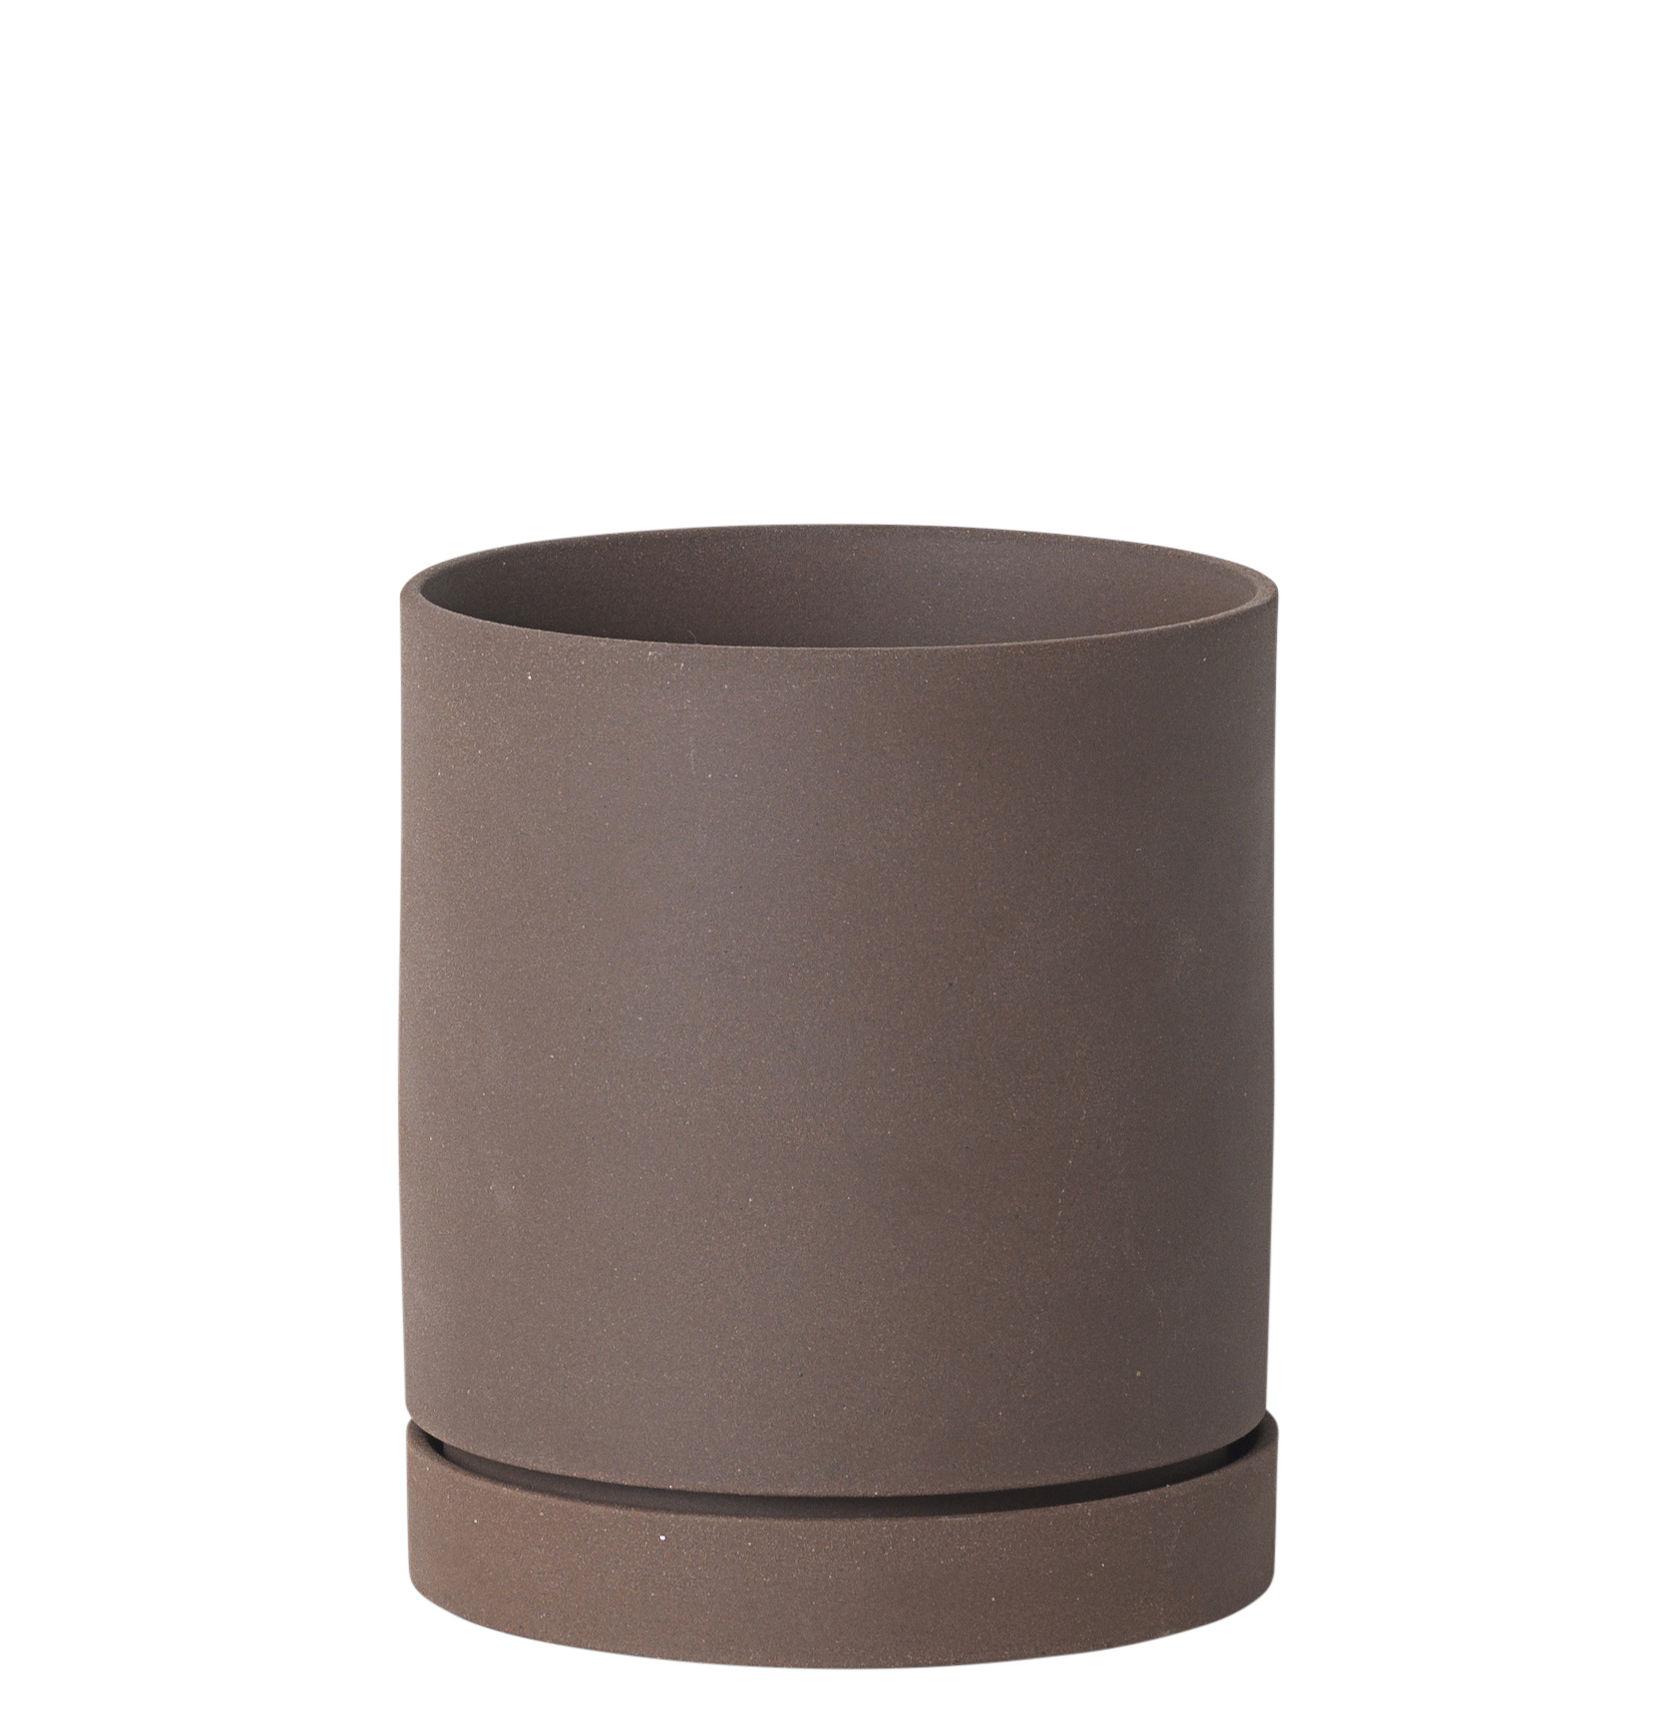 Outdoor - Pots & Plants - Sekki Medium Flowerpot - / Ø 13.5 x H 15.7 cm - Sandstone by Ferm Living - Rust - Sandstone